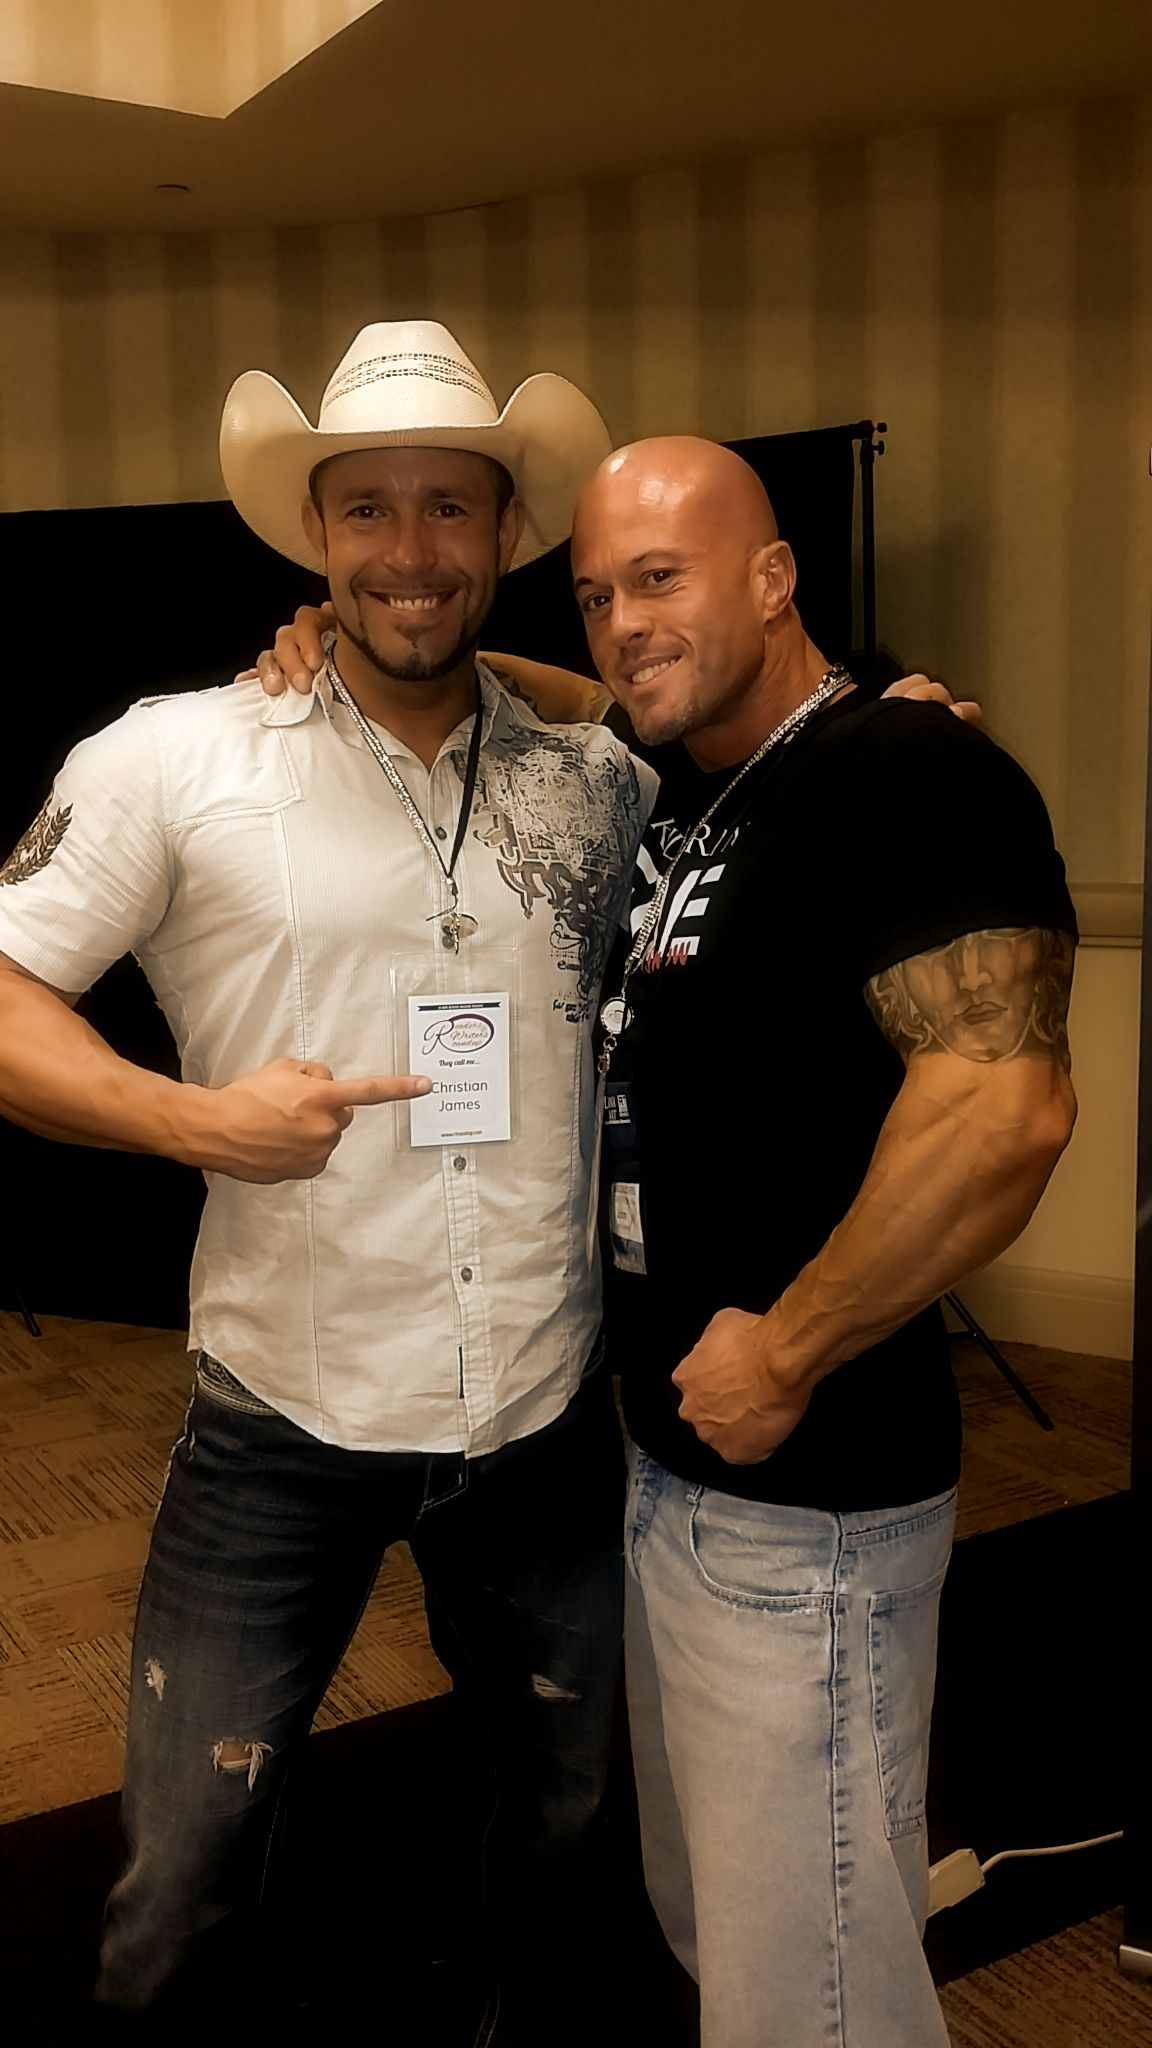 2015 RT Convention Sunday Roundup Cover Model Men of Romance Christian James & John Quinlan @ the Hyatt Regency Hotel in Dallas, Texas on May 17, 2015 #JohnQuinlan #ChristianJames #RT15